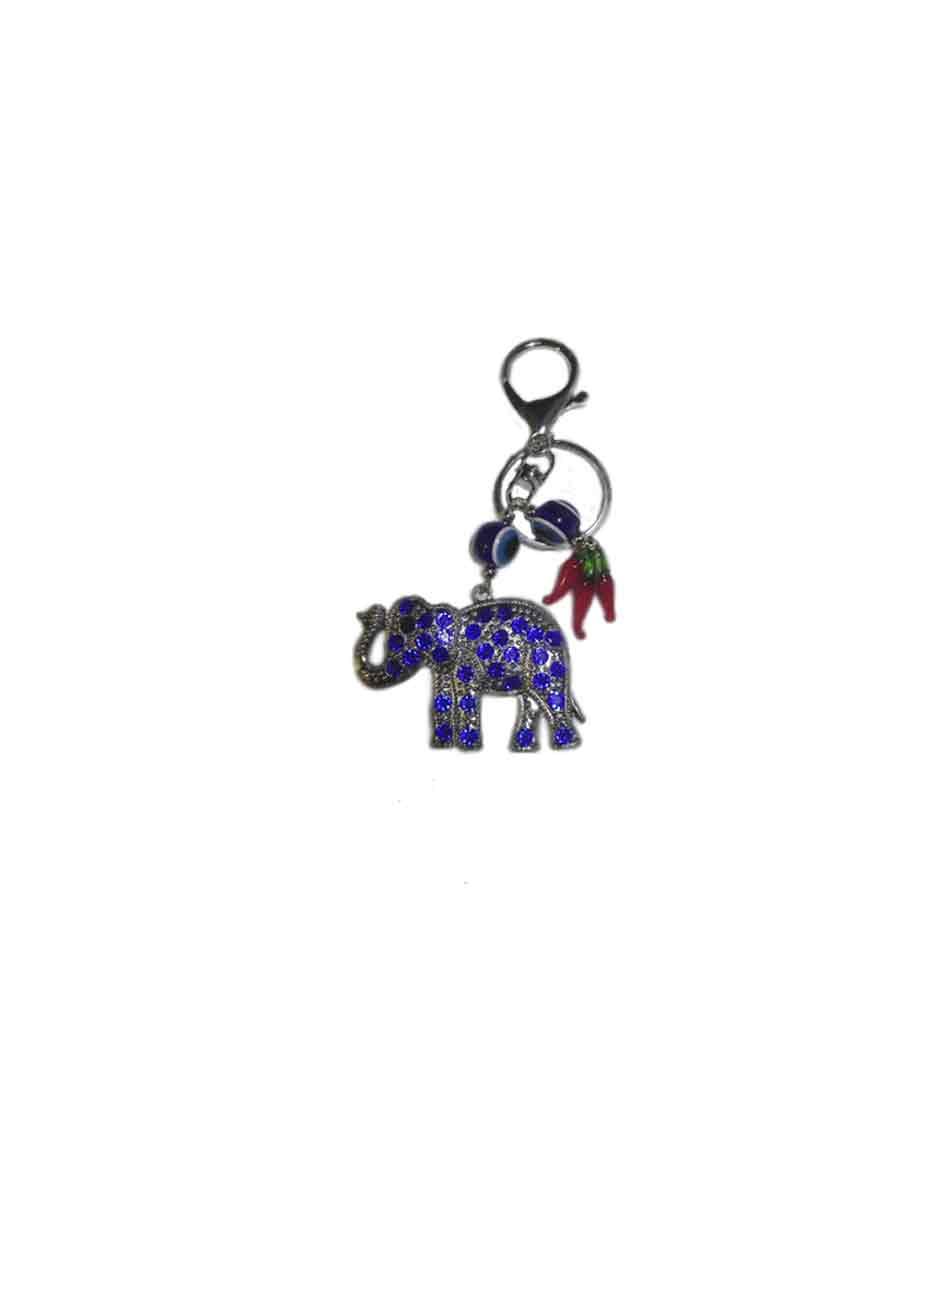 Llavero Tercer Ojo con Elefante